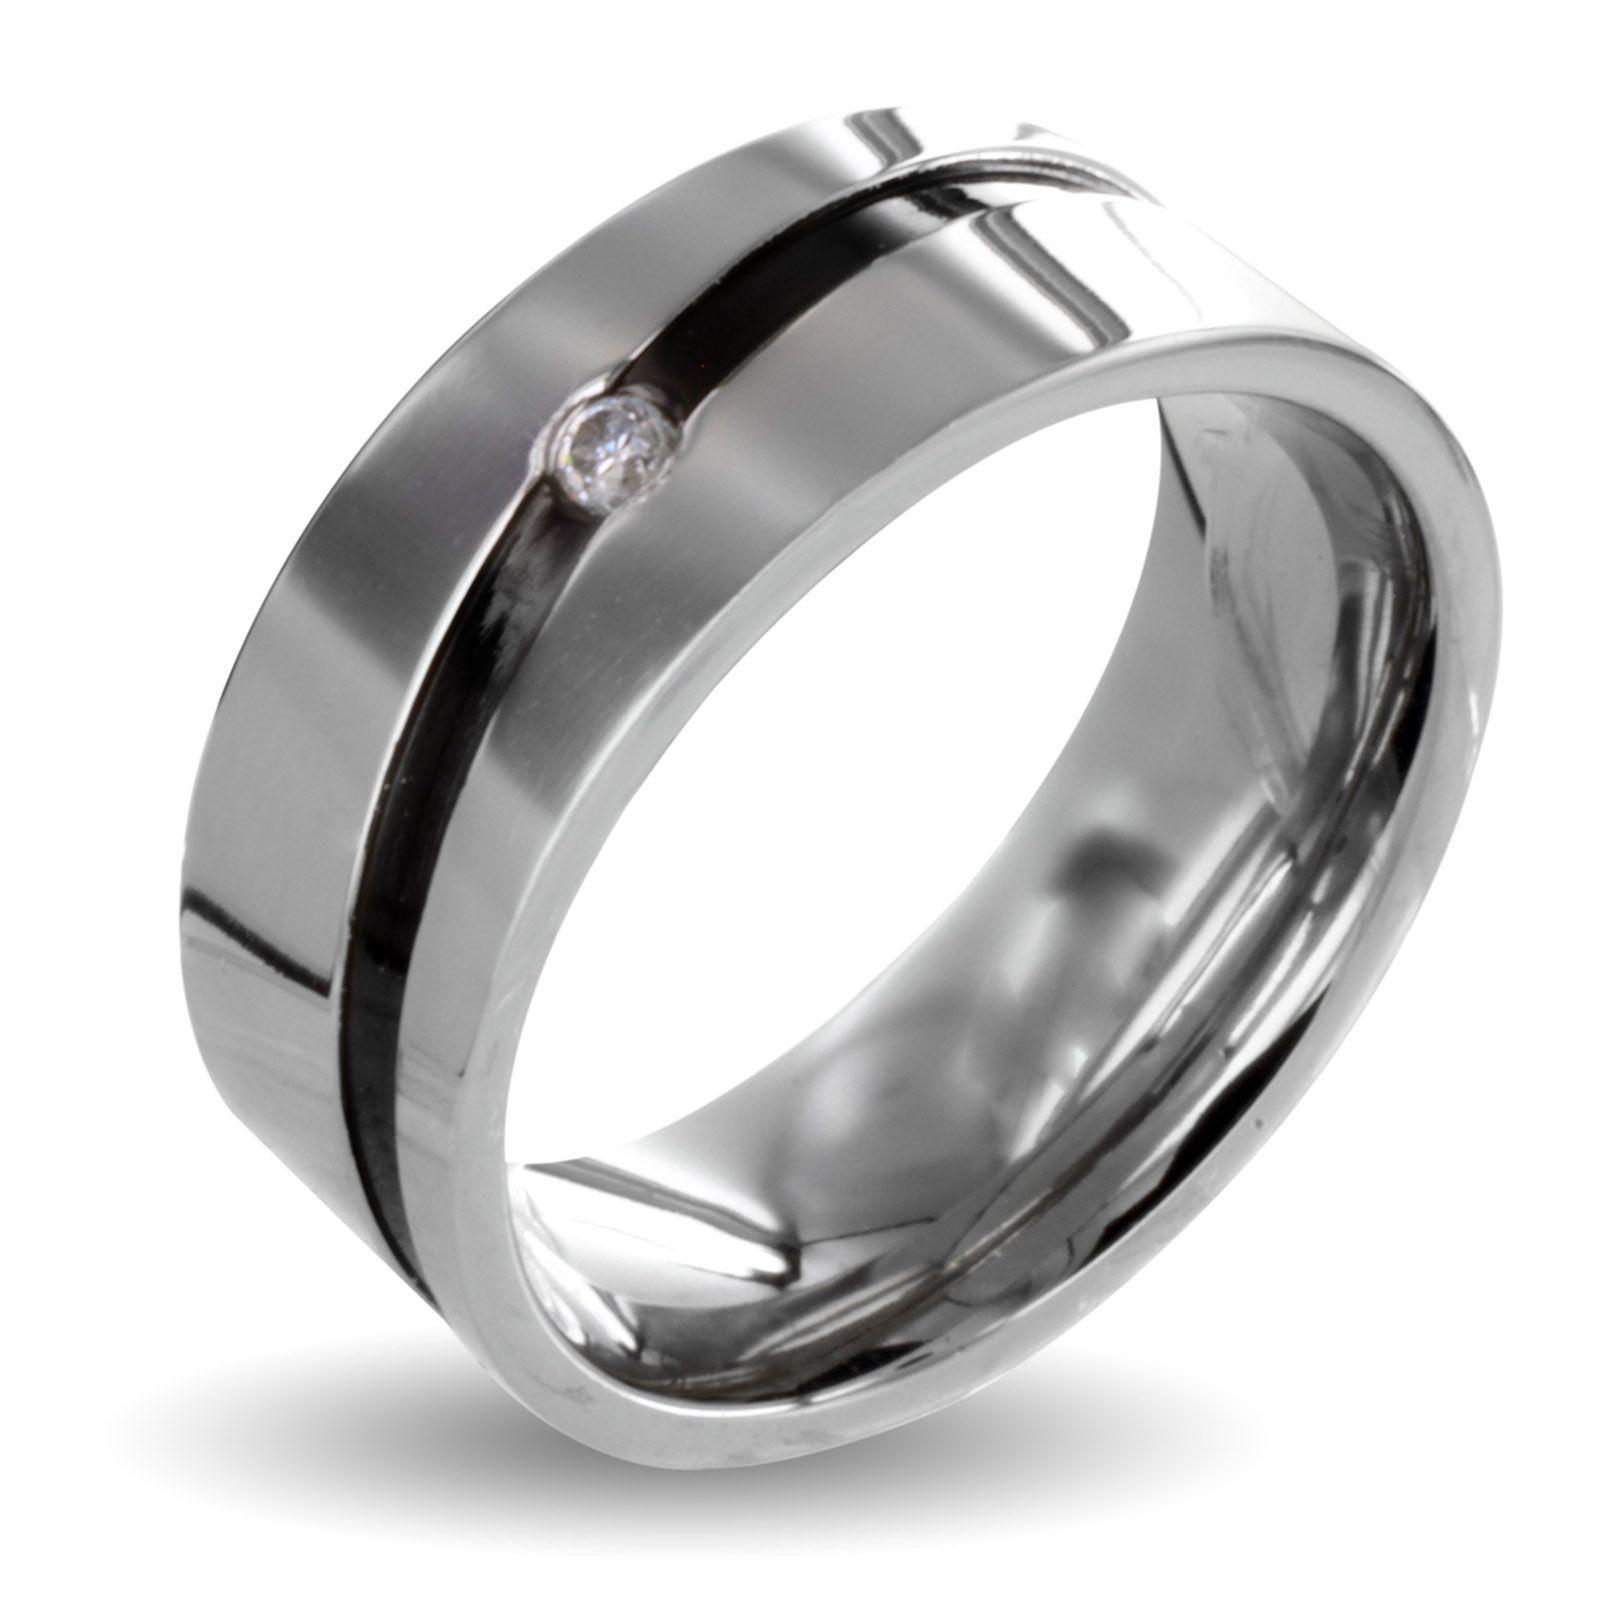 West Coast Jewelry Men's Stainless Steel Cubic Zirconia